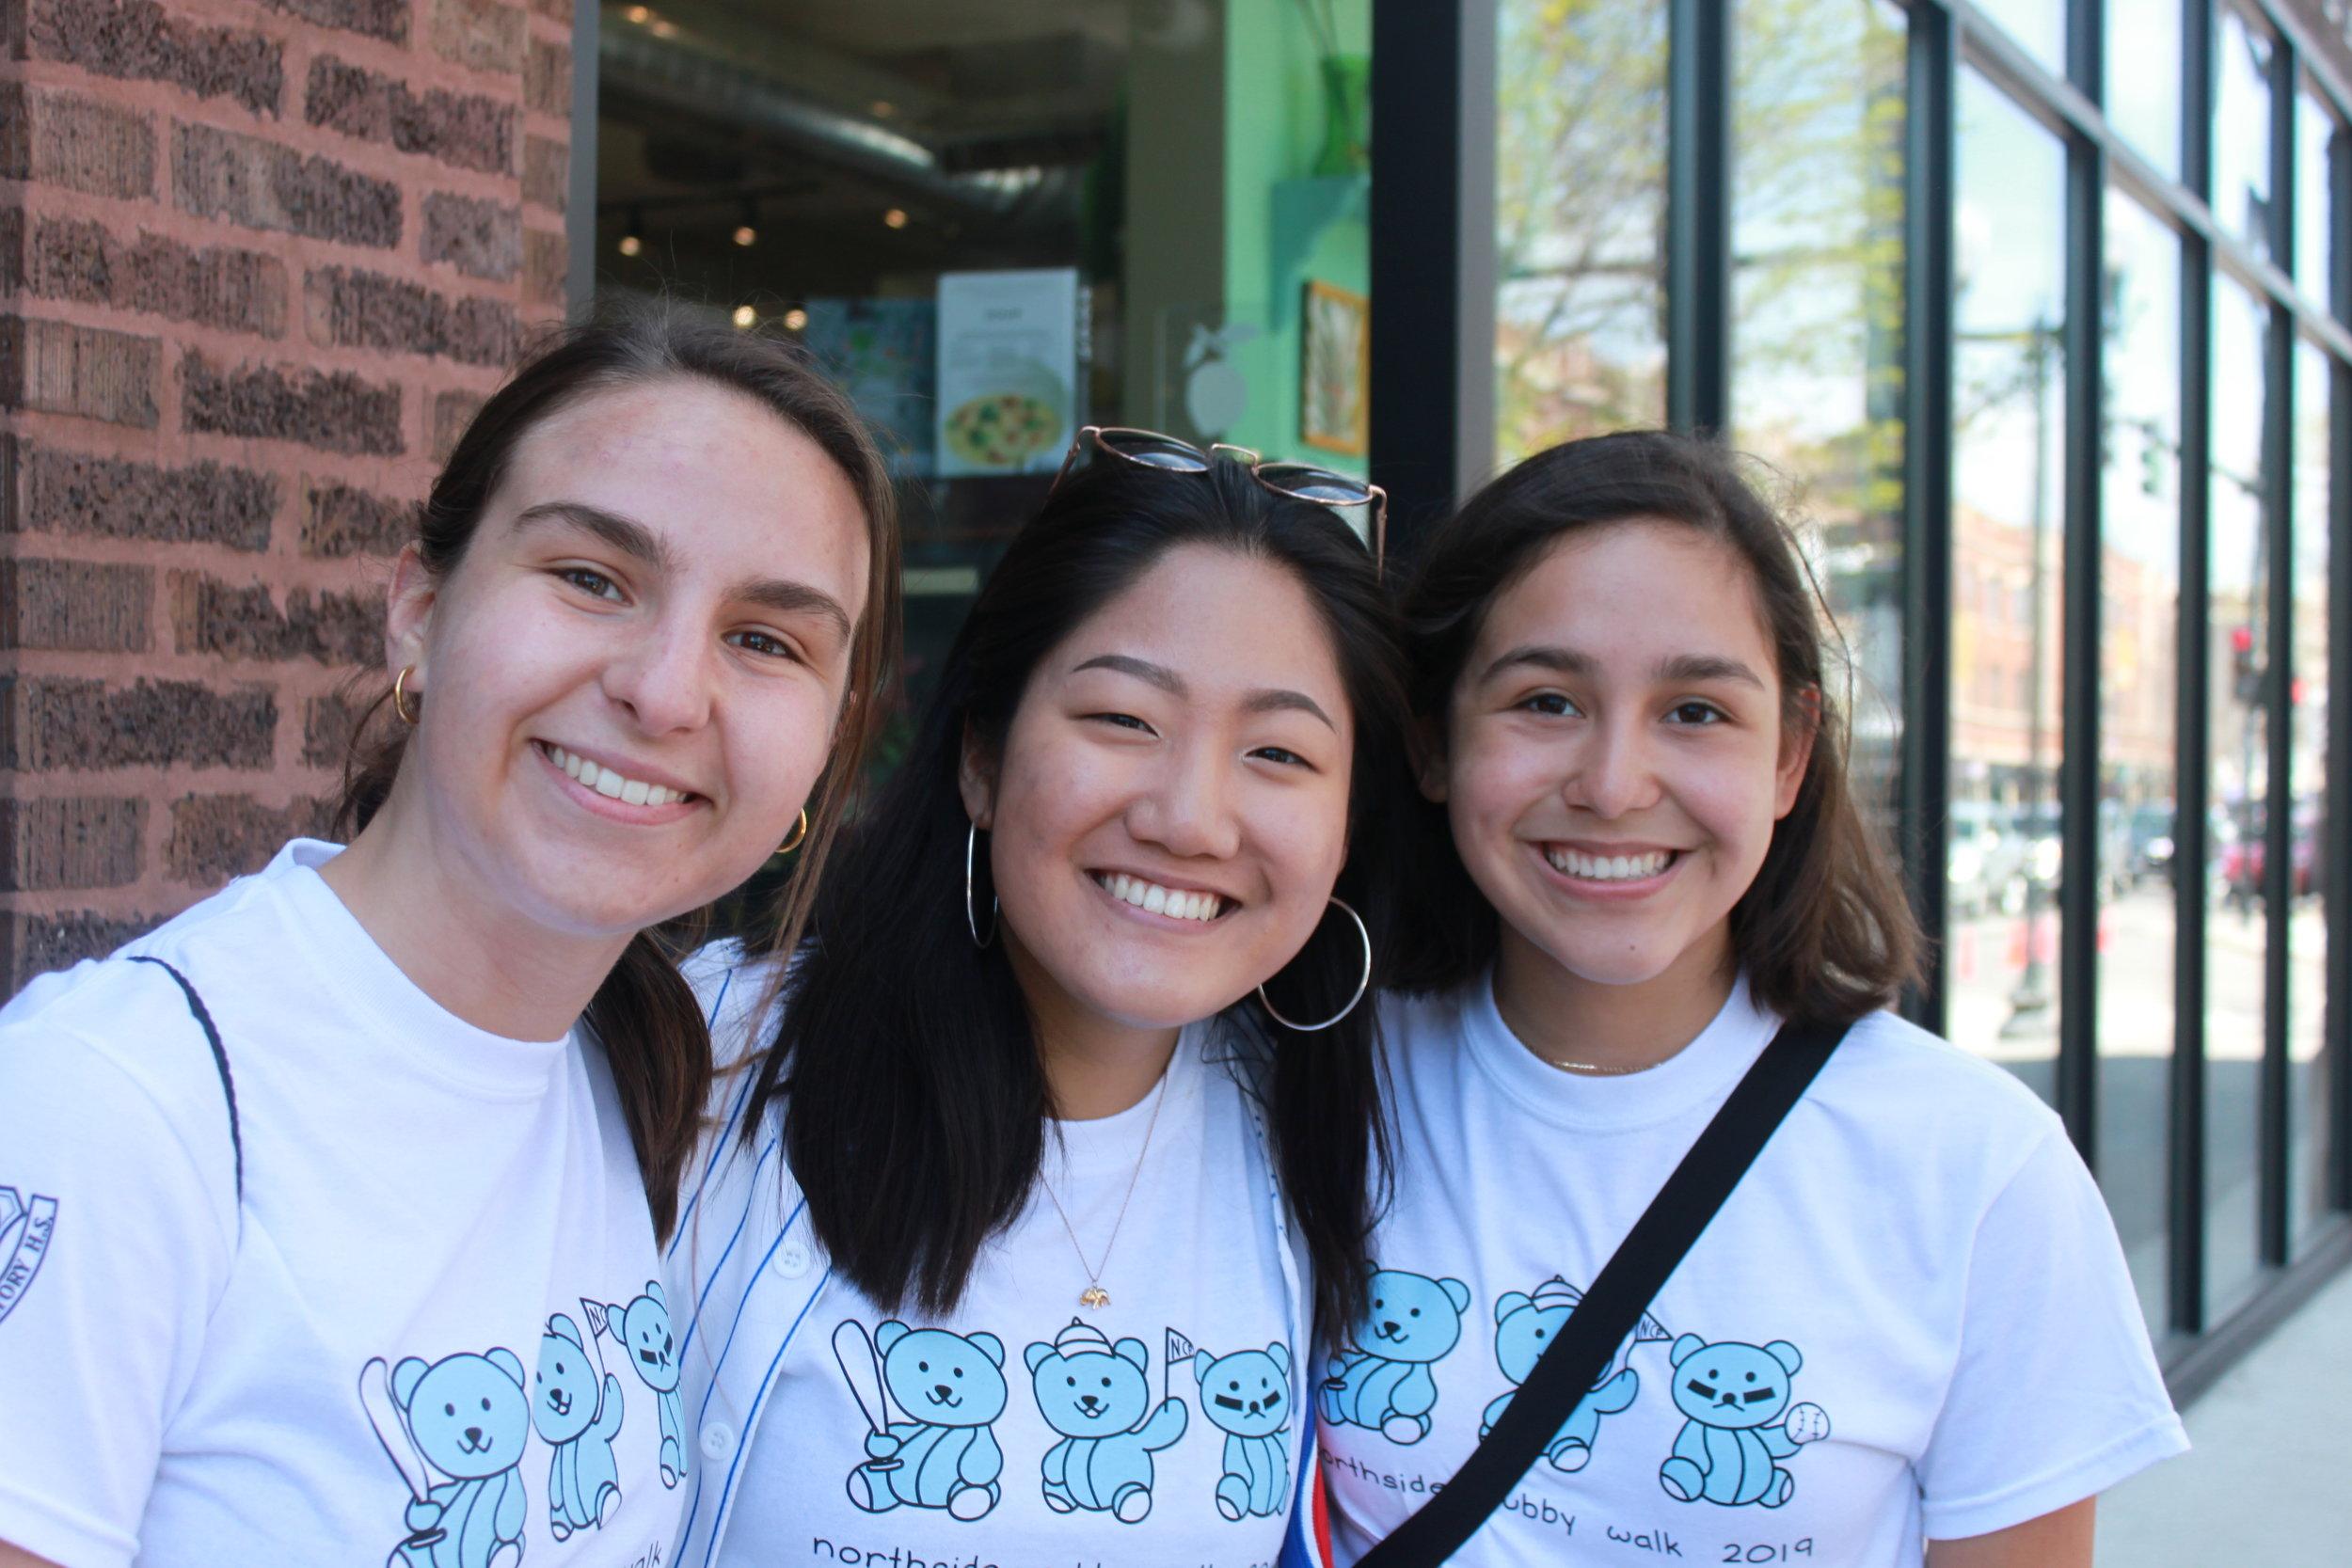 Kimberly Grabiec, Adv. 902, Christina Yoon, Adv. 903, and Gabriela Jimenez, Adv. 902 wear Kimberly's stunning shirt design